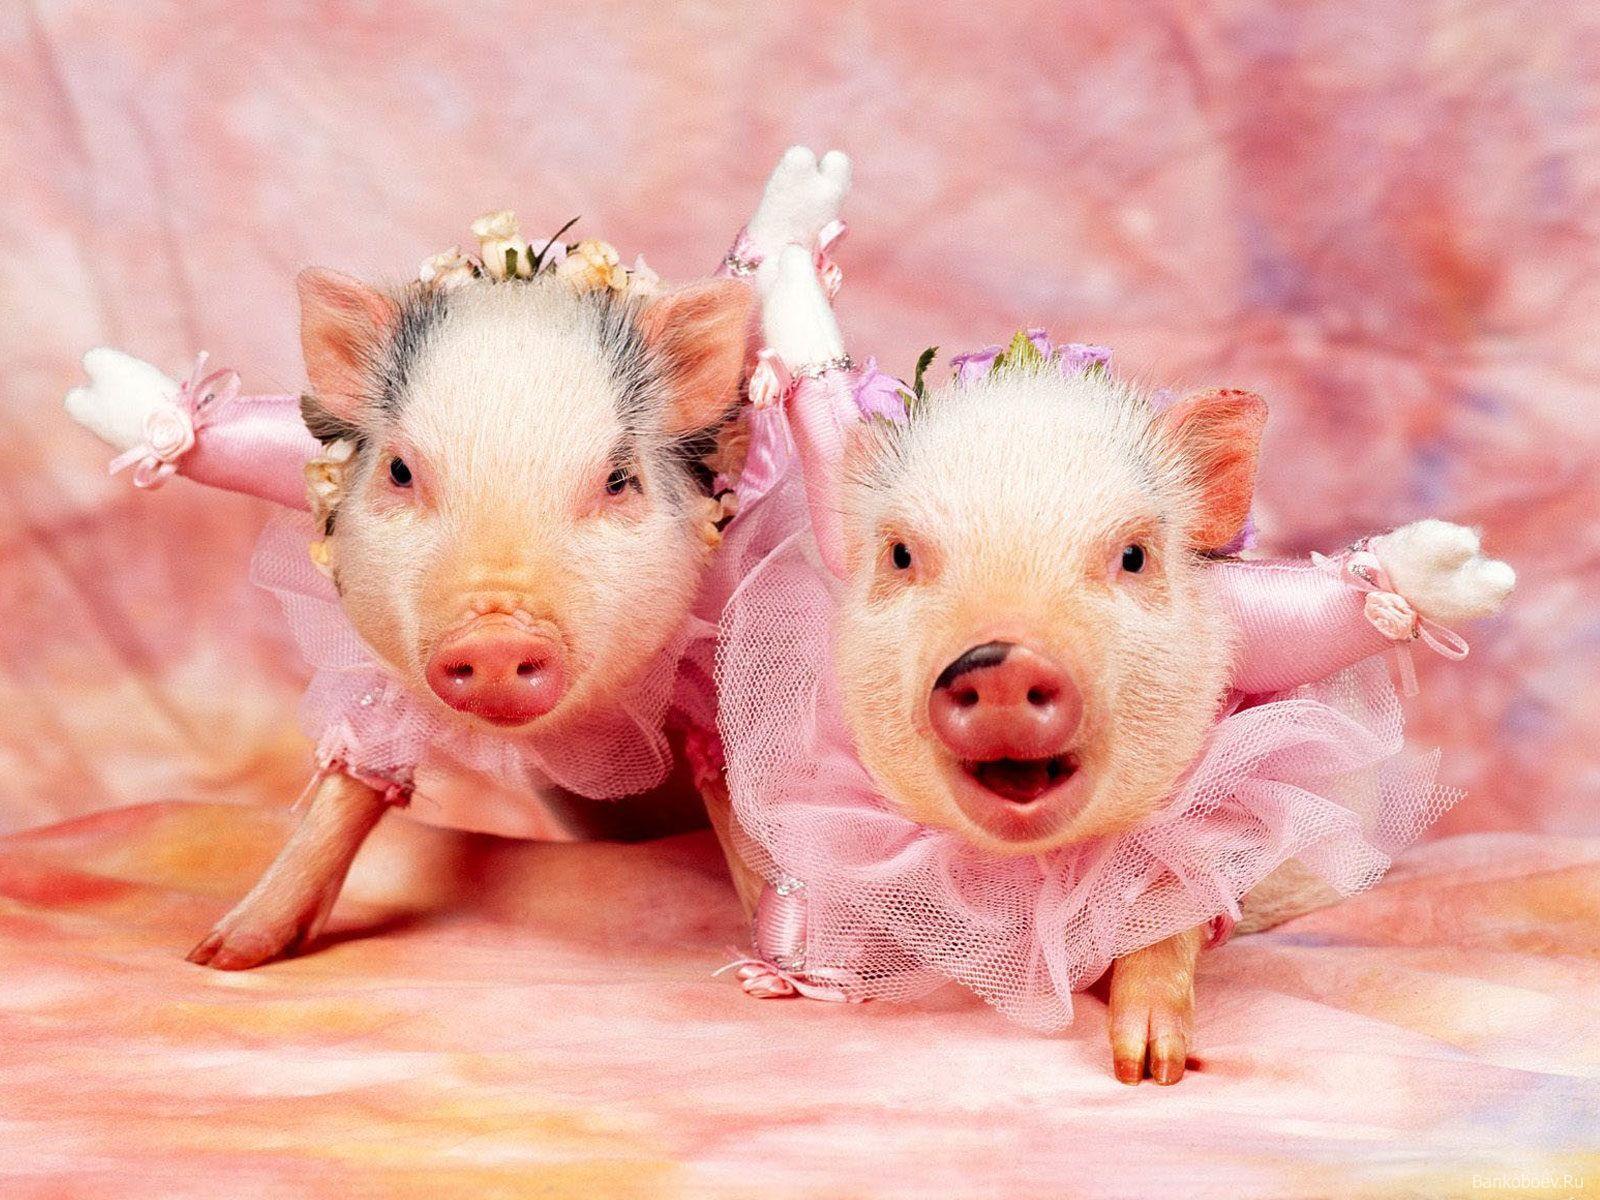 Fondos de pantalla Android Cerdos divertidos, Animales